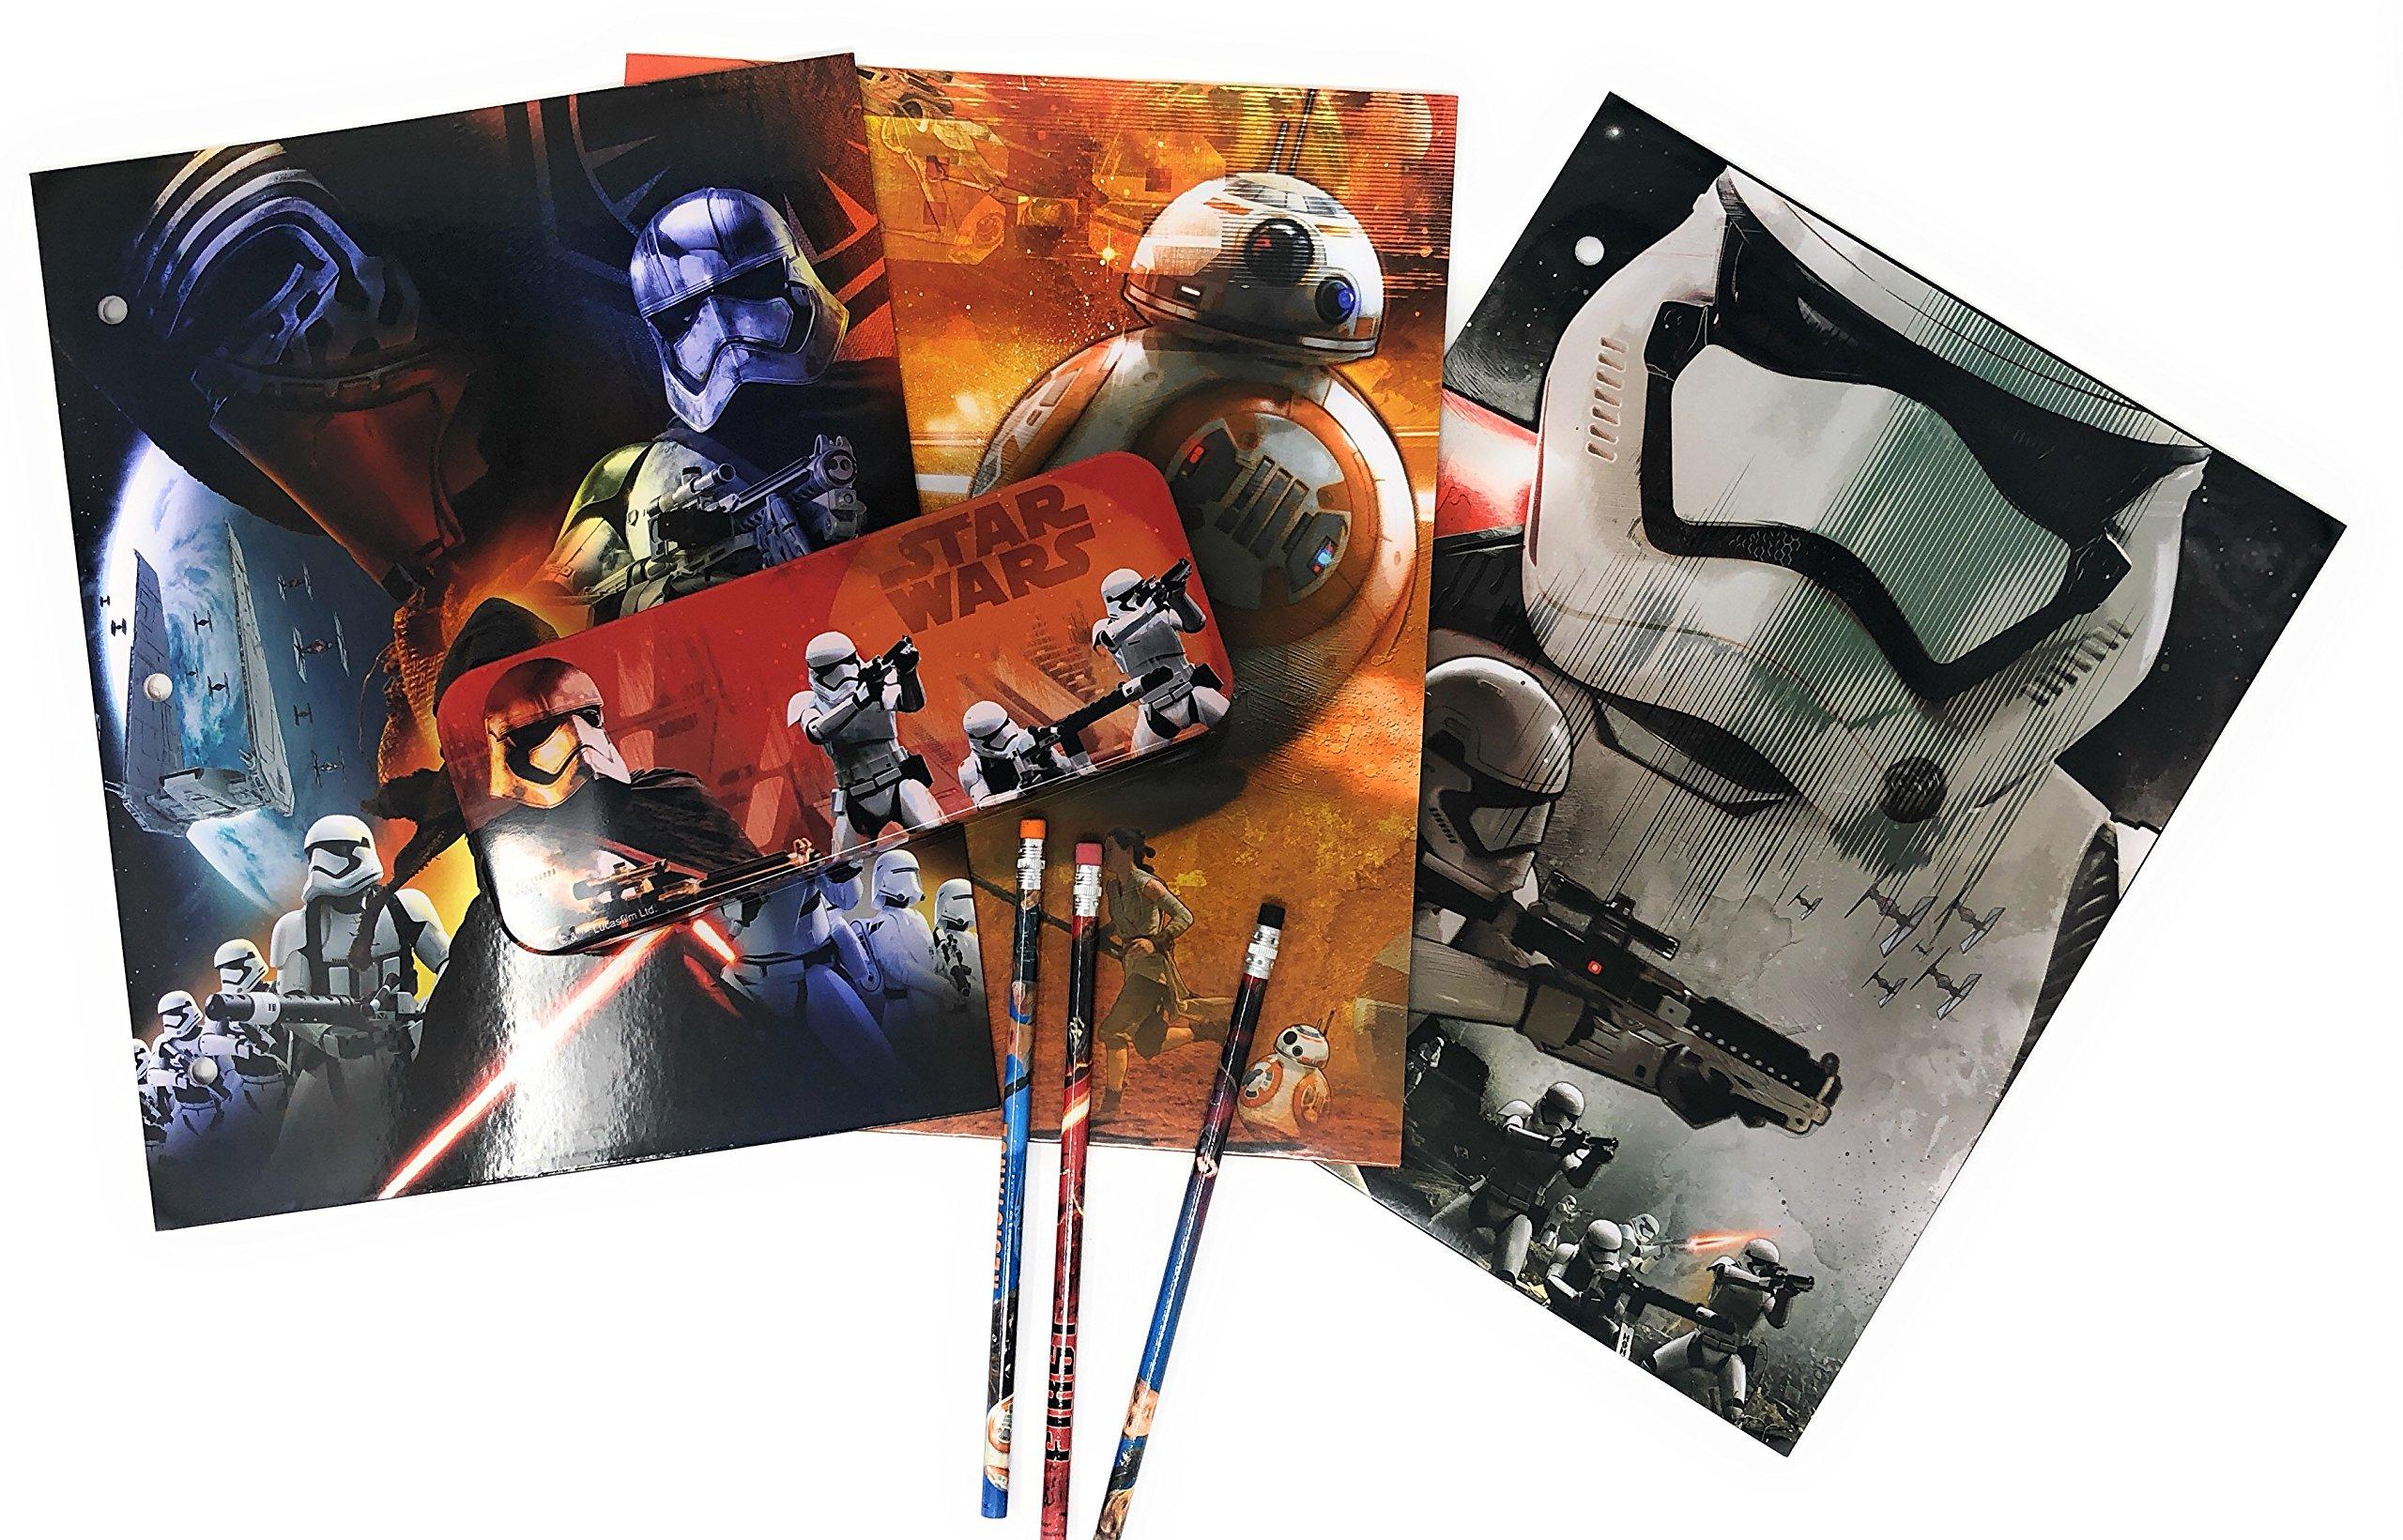 Star Wars 7 Portfolio The Force Awakens - Set of 3 Portfolio 2 Pocket School Folders, Metal Tin Pencil Box with Pencils (Storm Tr)